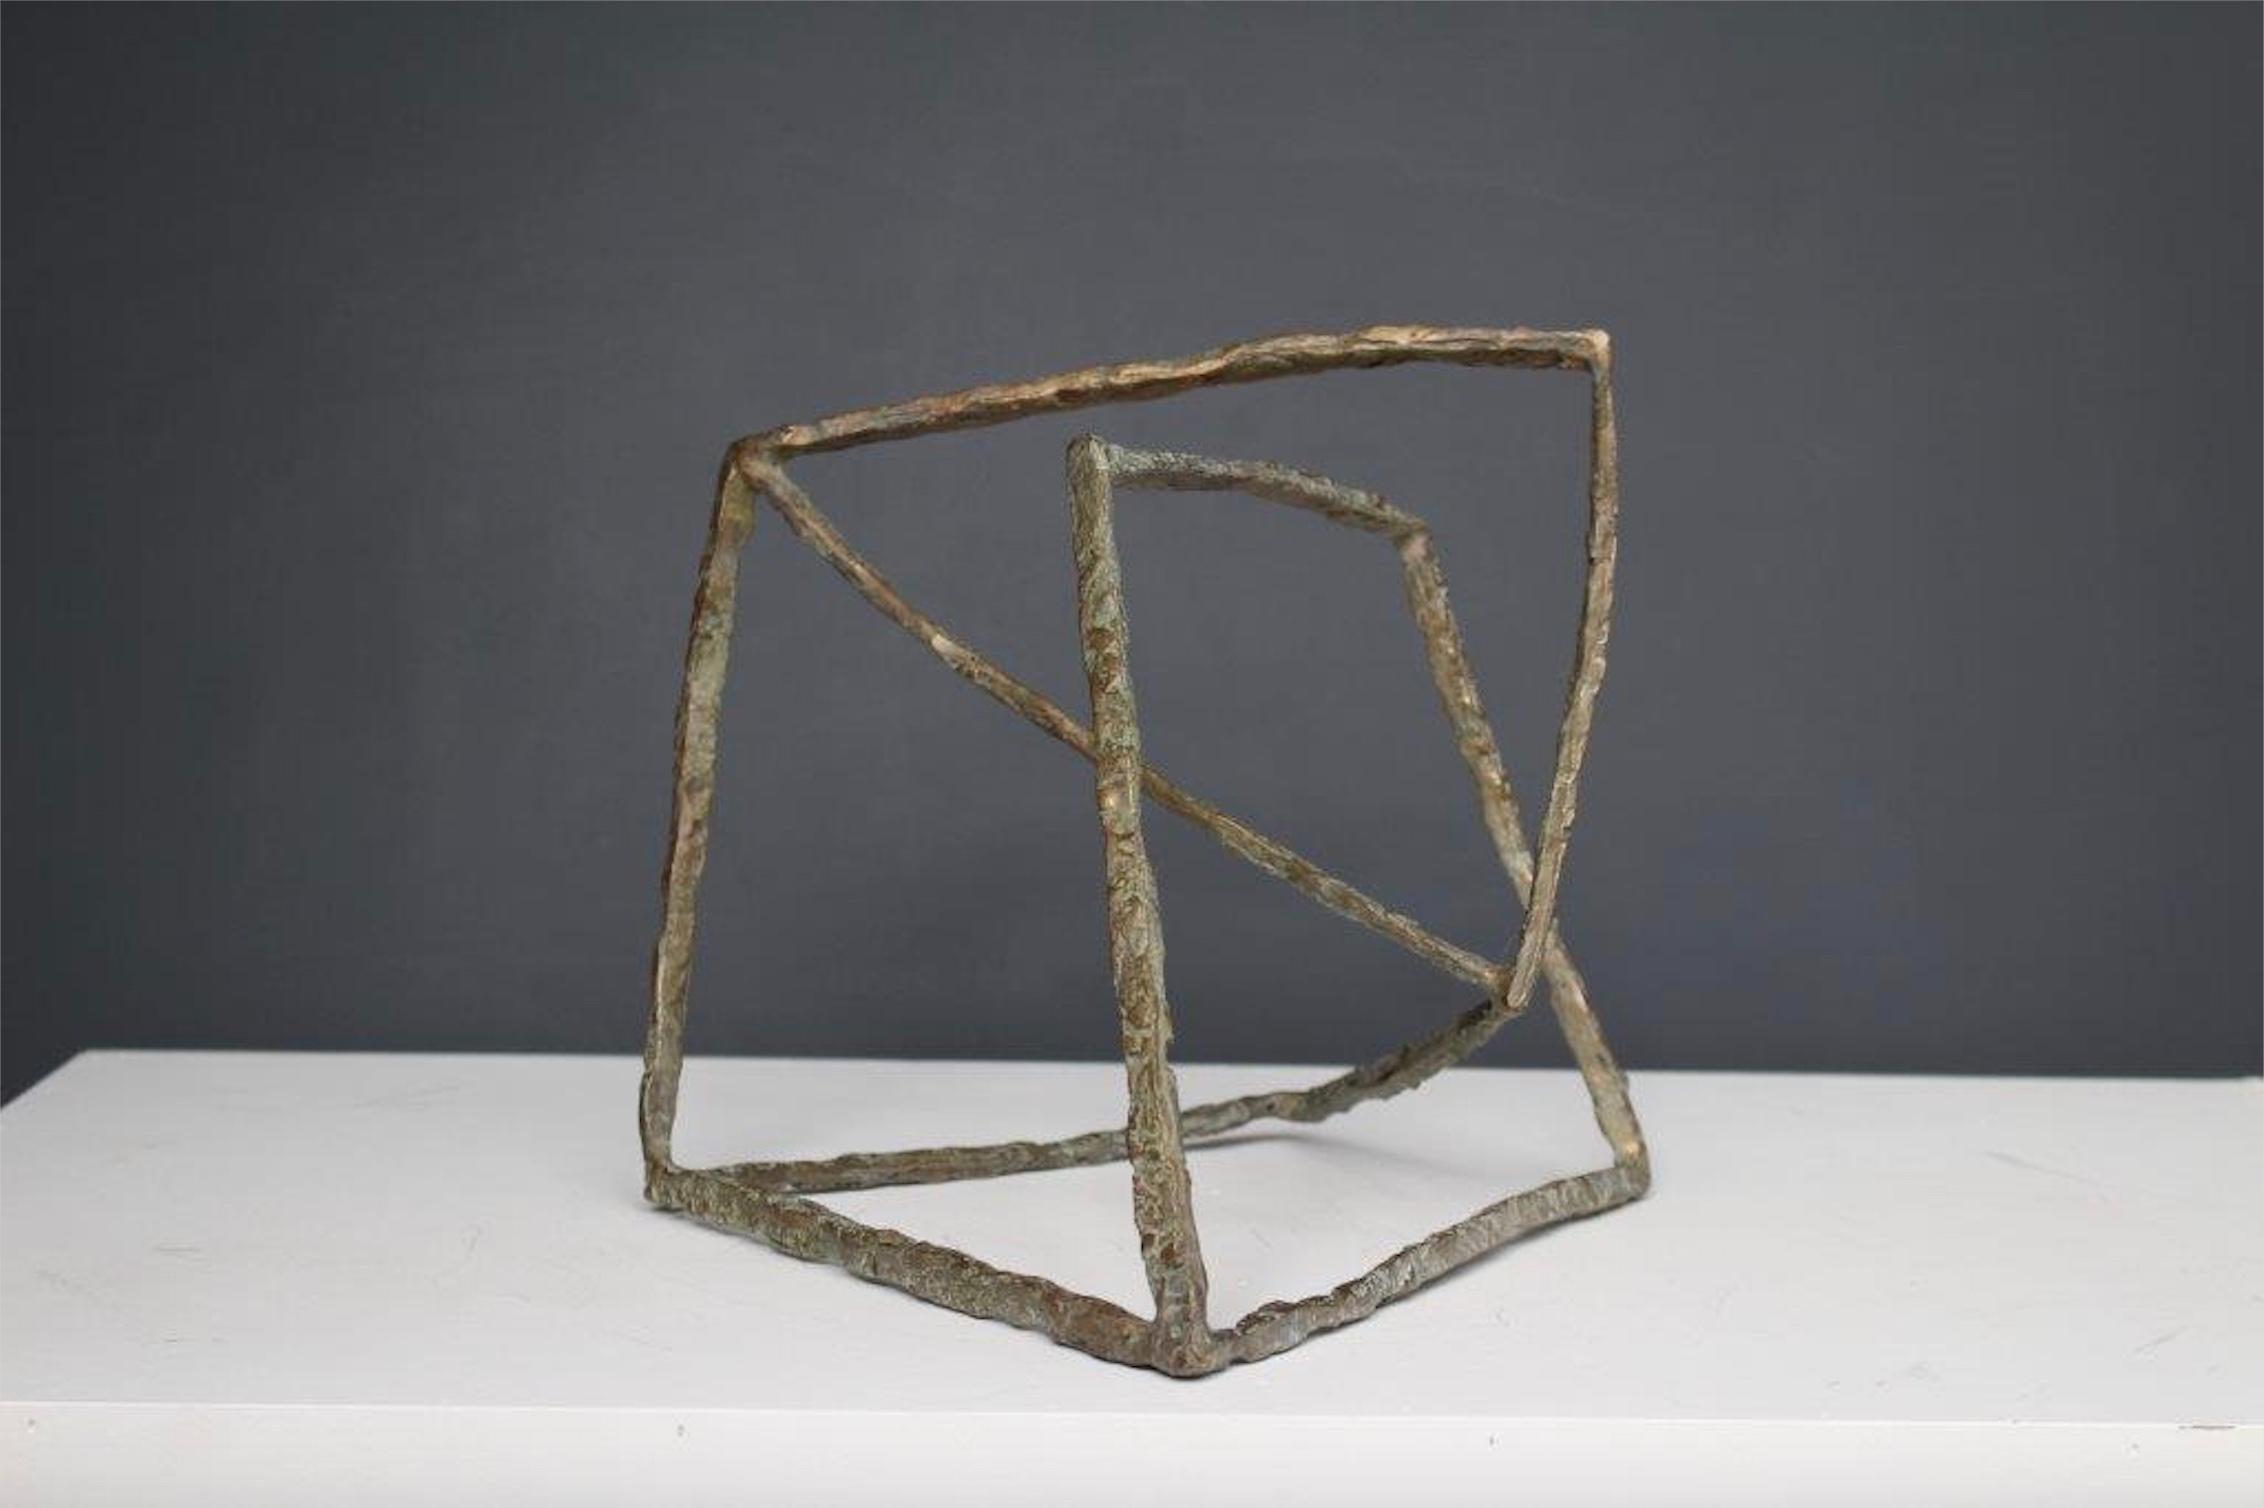 Variation - Abstract Bronze Sculpture